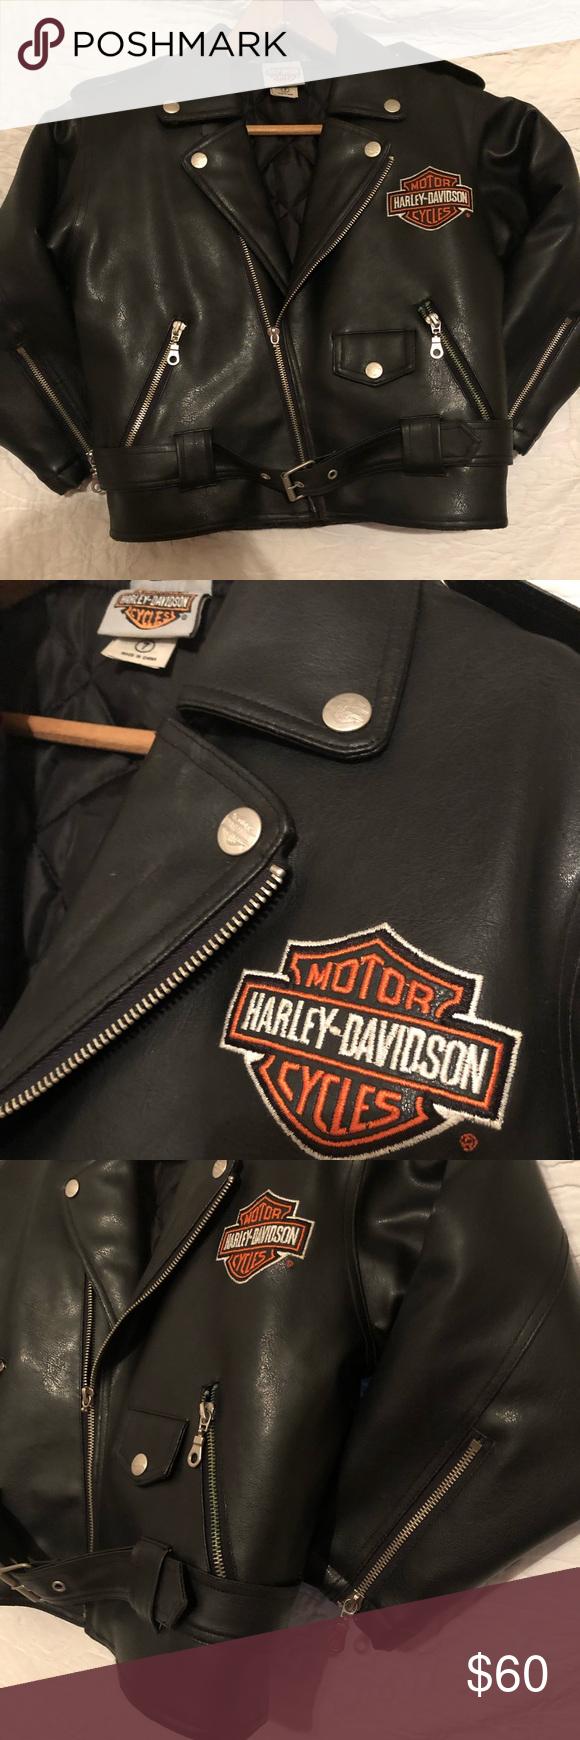 Harley Davidson Kids Biker Jacket Sz 7 60 Harley Davidson Kids Jackets Biker Jacket [ 1740 x 580 Pixel ]